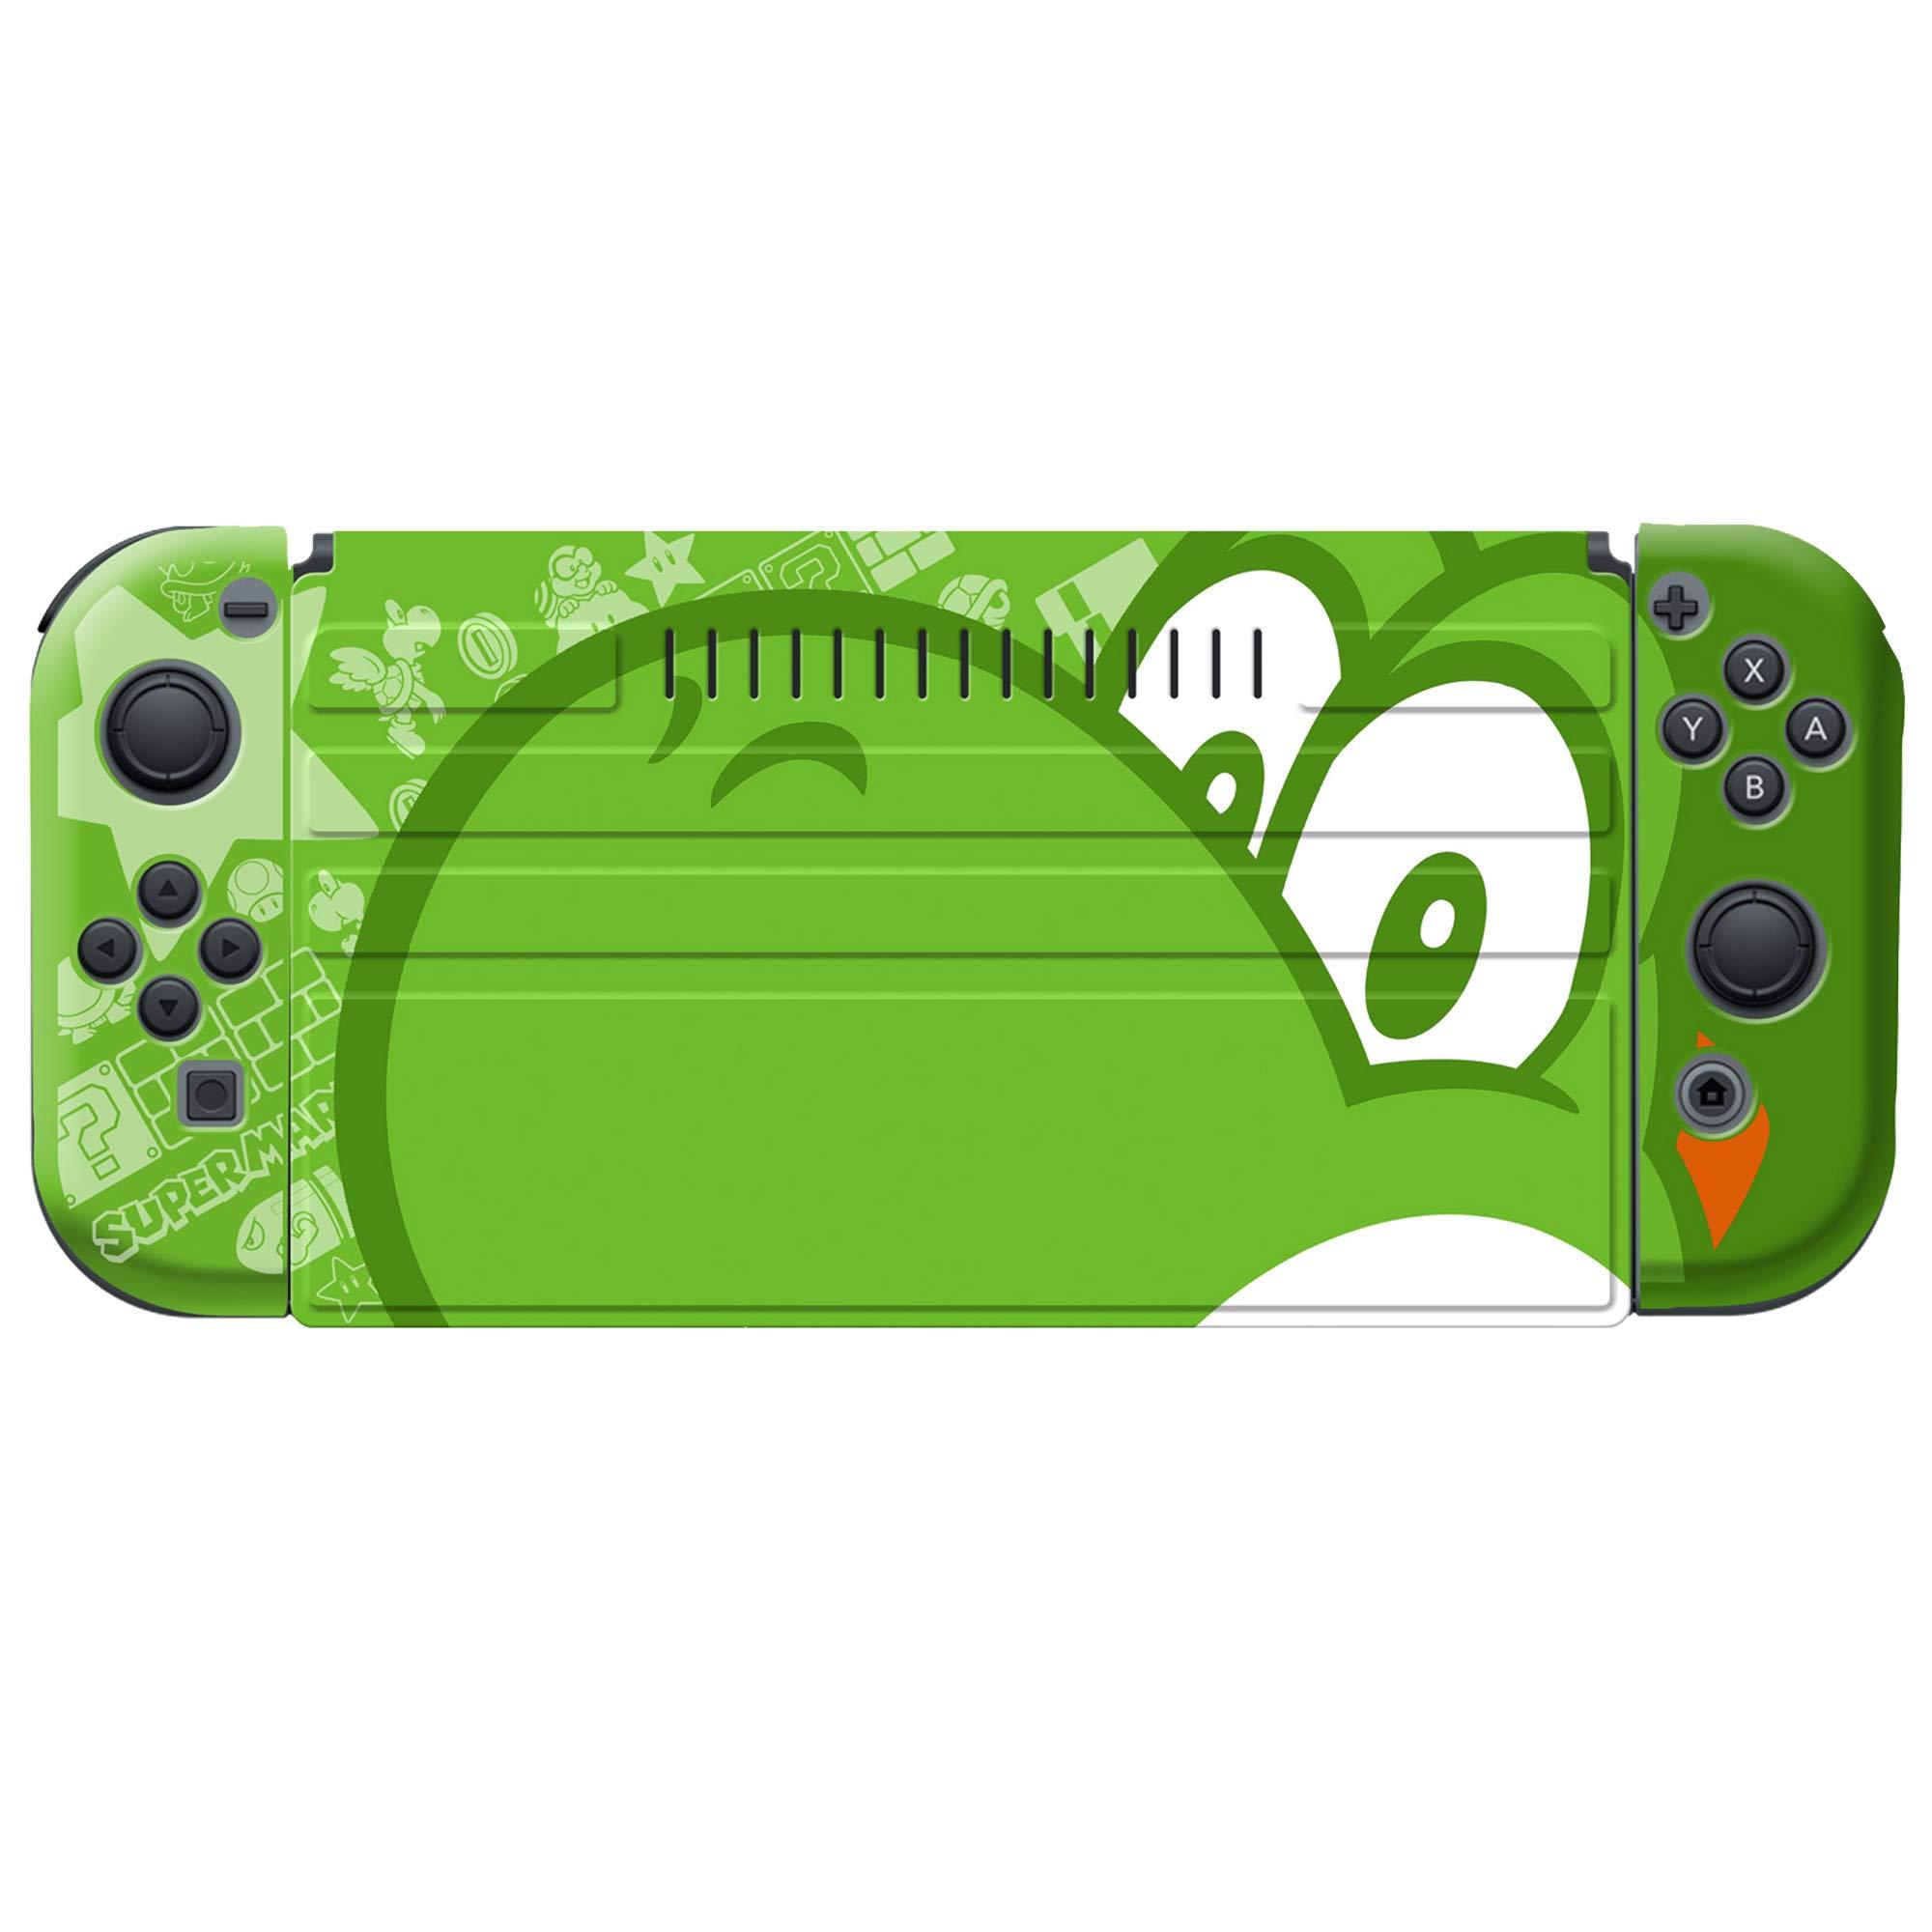 Nintendo Switch -(super mario case) protector case (B07HQRJXTF) Amazon Price History, Amazon Price Tracker